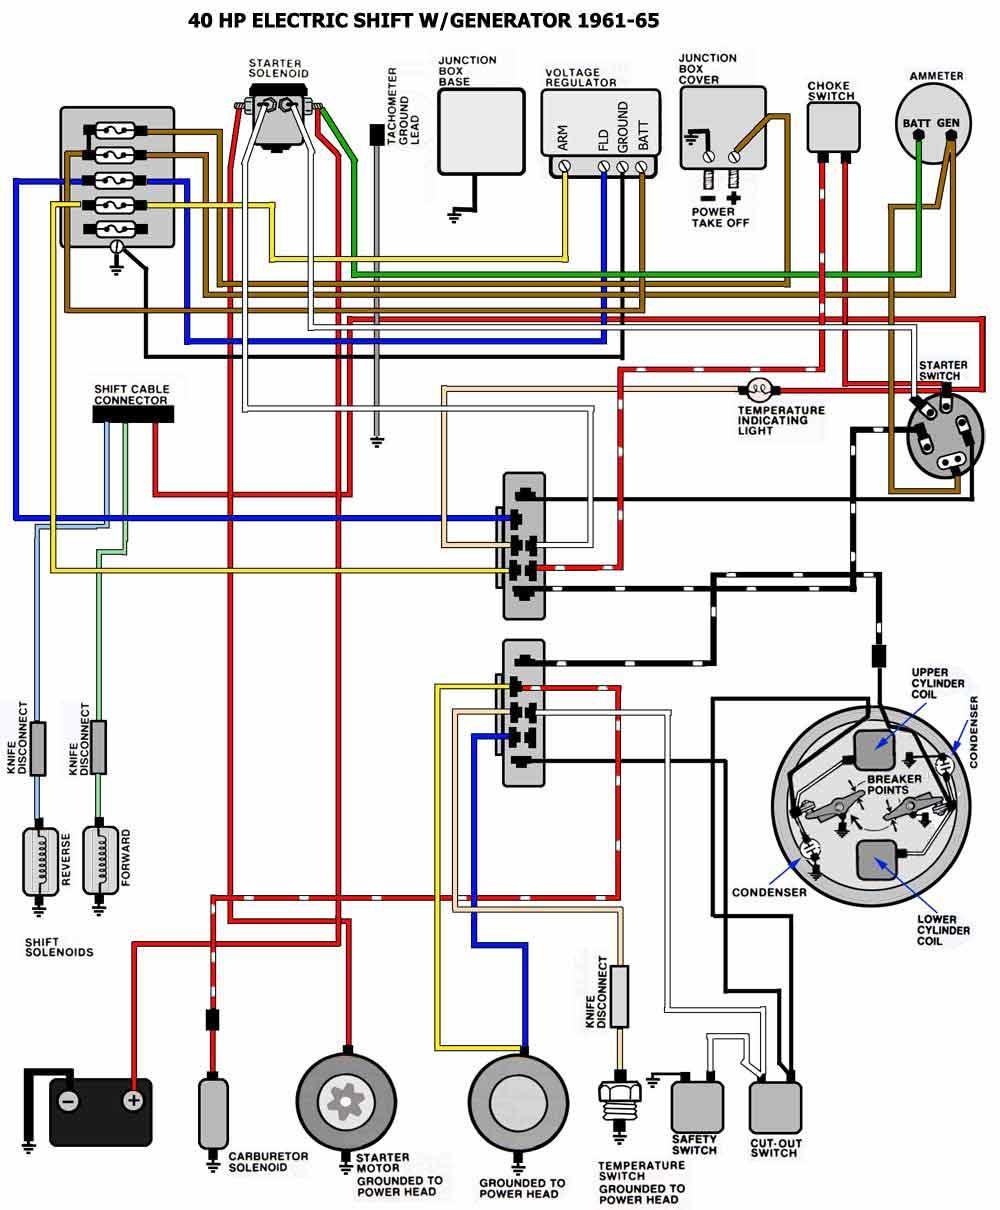 Fiberglassics Tach Signal Wire 64 Lark Vi Fiberglassics Forums